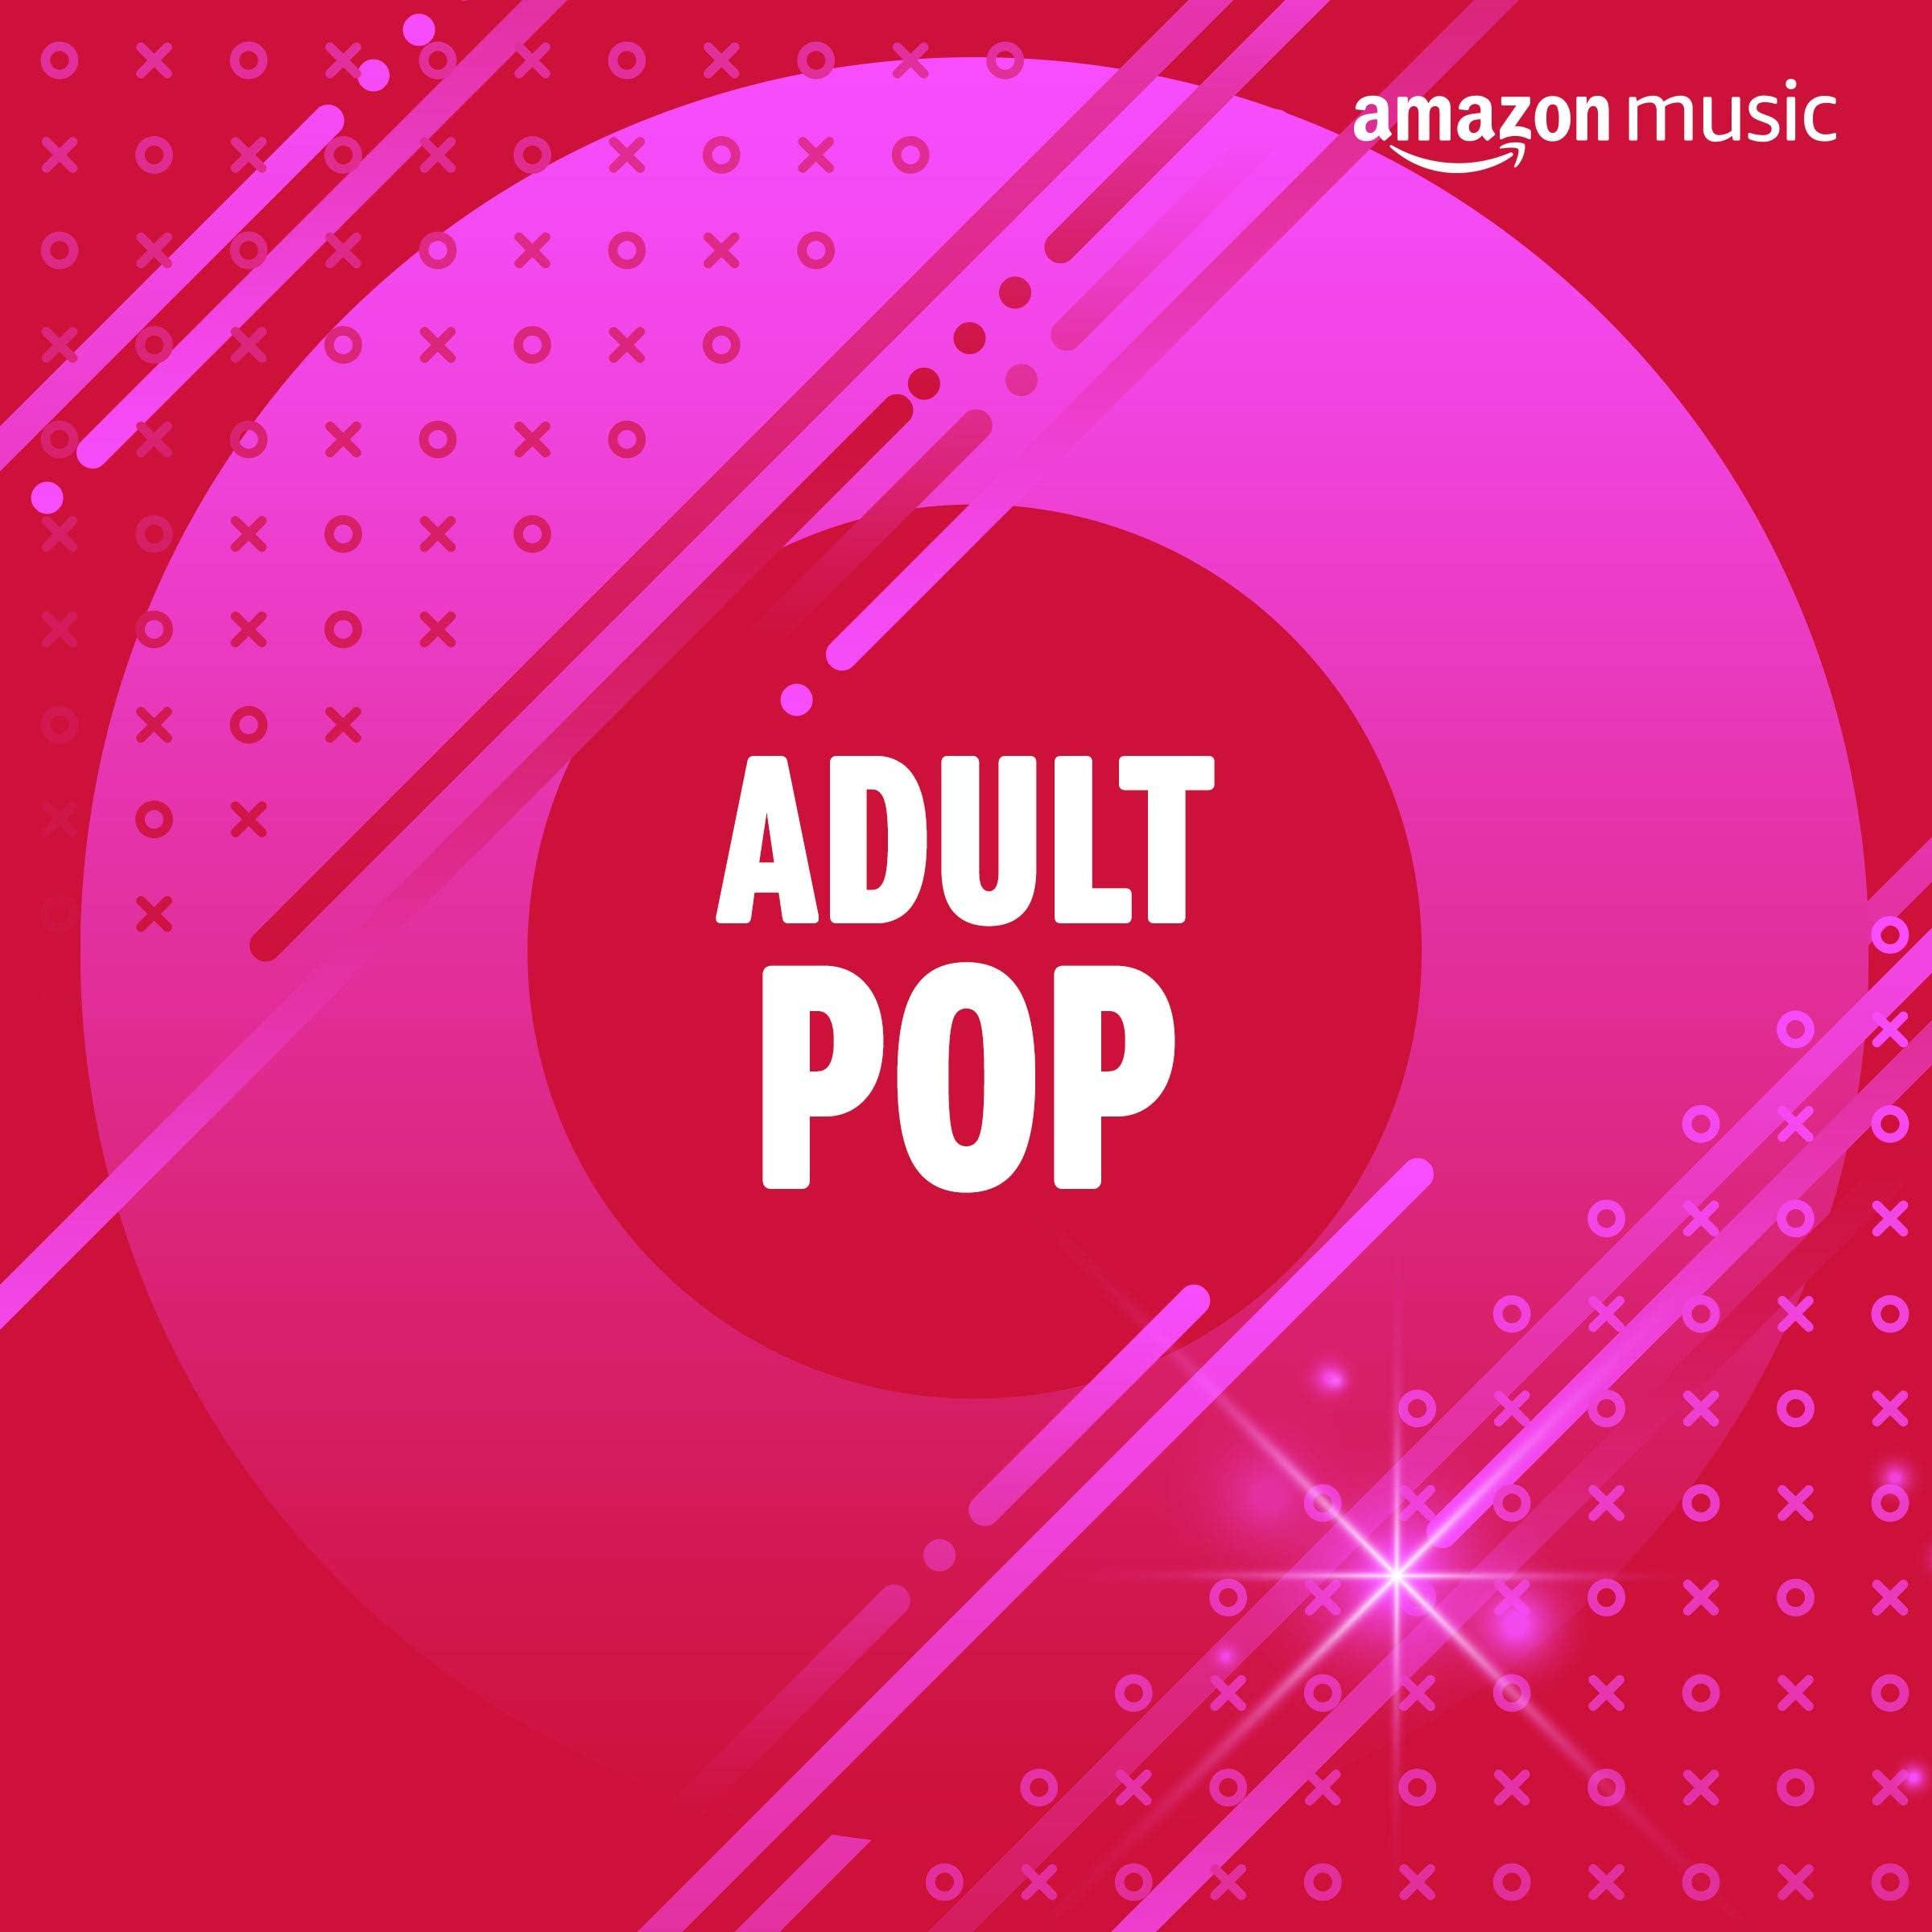 Adult Pop